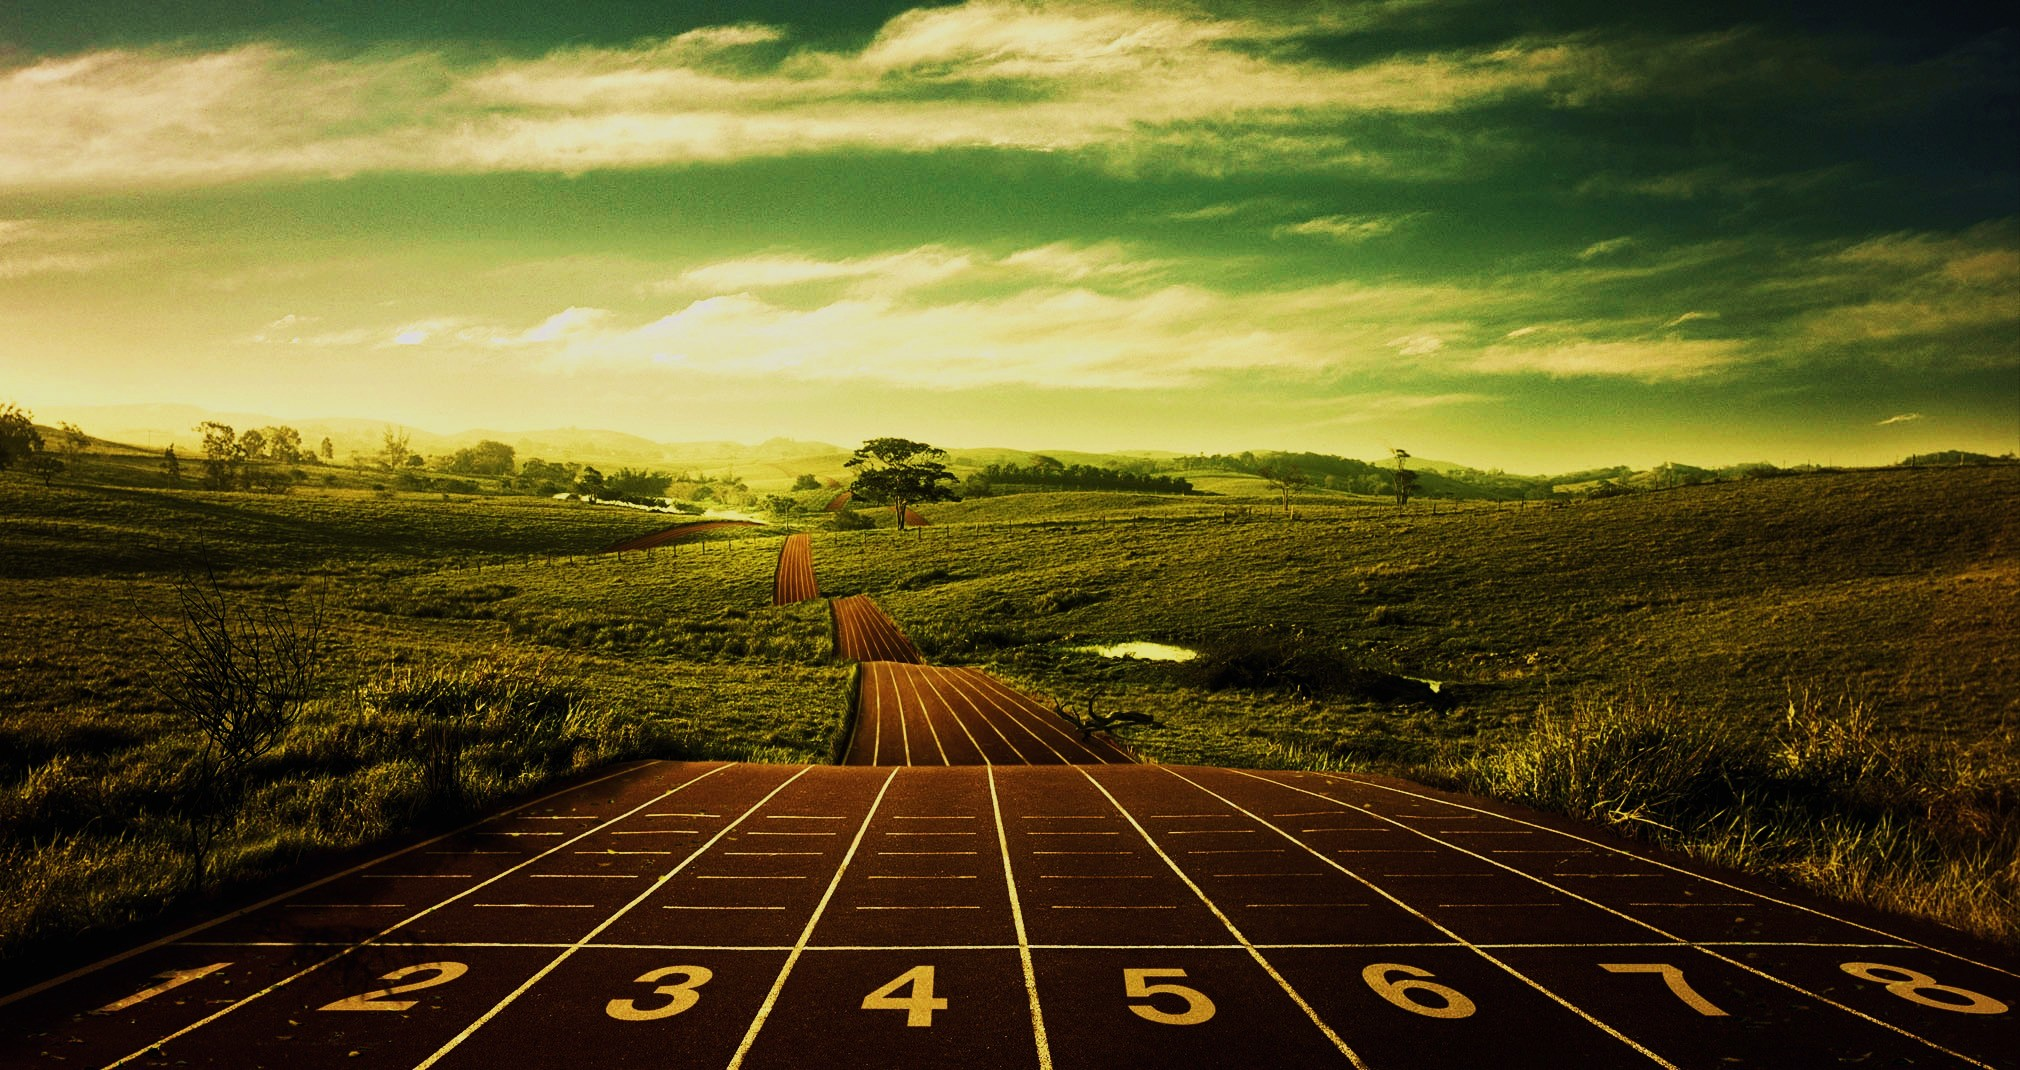 Wallpapersafari: Marathon Running Wallpaper